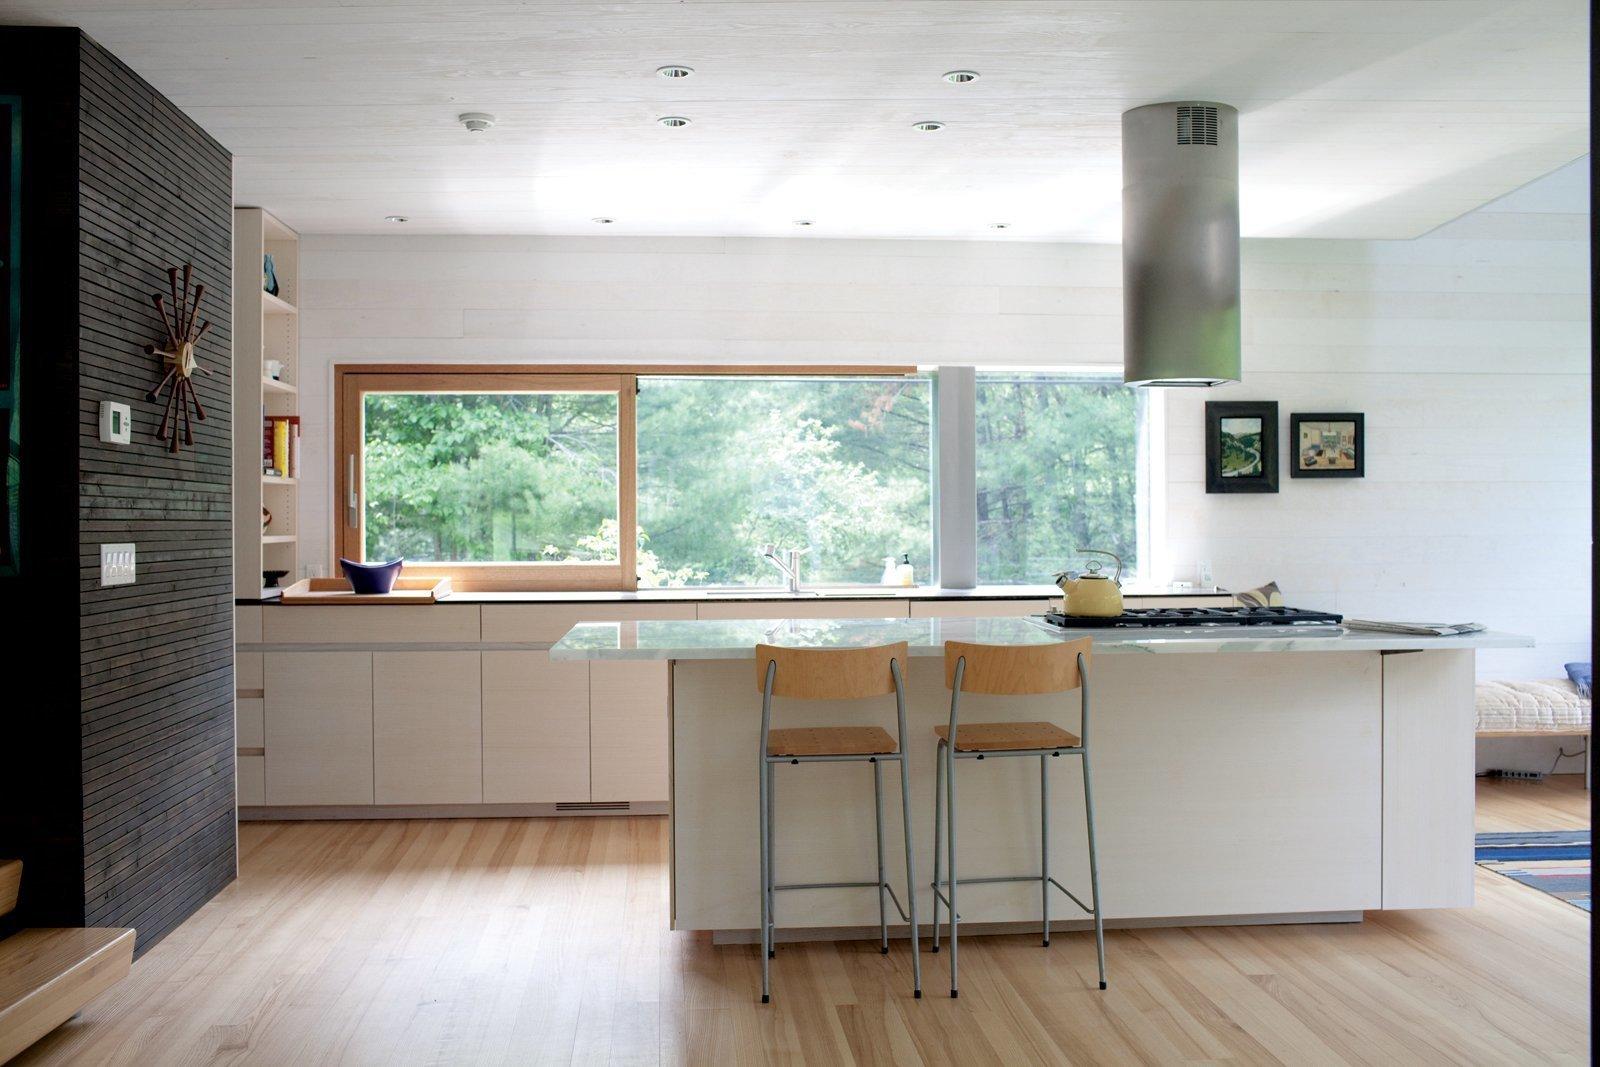 Kitchen, Range Hood, Open Cabinet, Light Hardwood Floor, Recessed Lighting, Range, and Undermount Sink  Photo 3 of 6 in 6 Integrated Appliances Sure to Make Your Kitchen Super Sleek